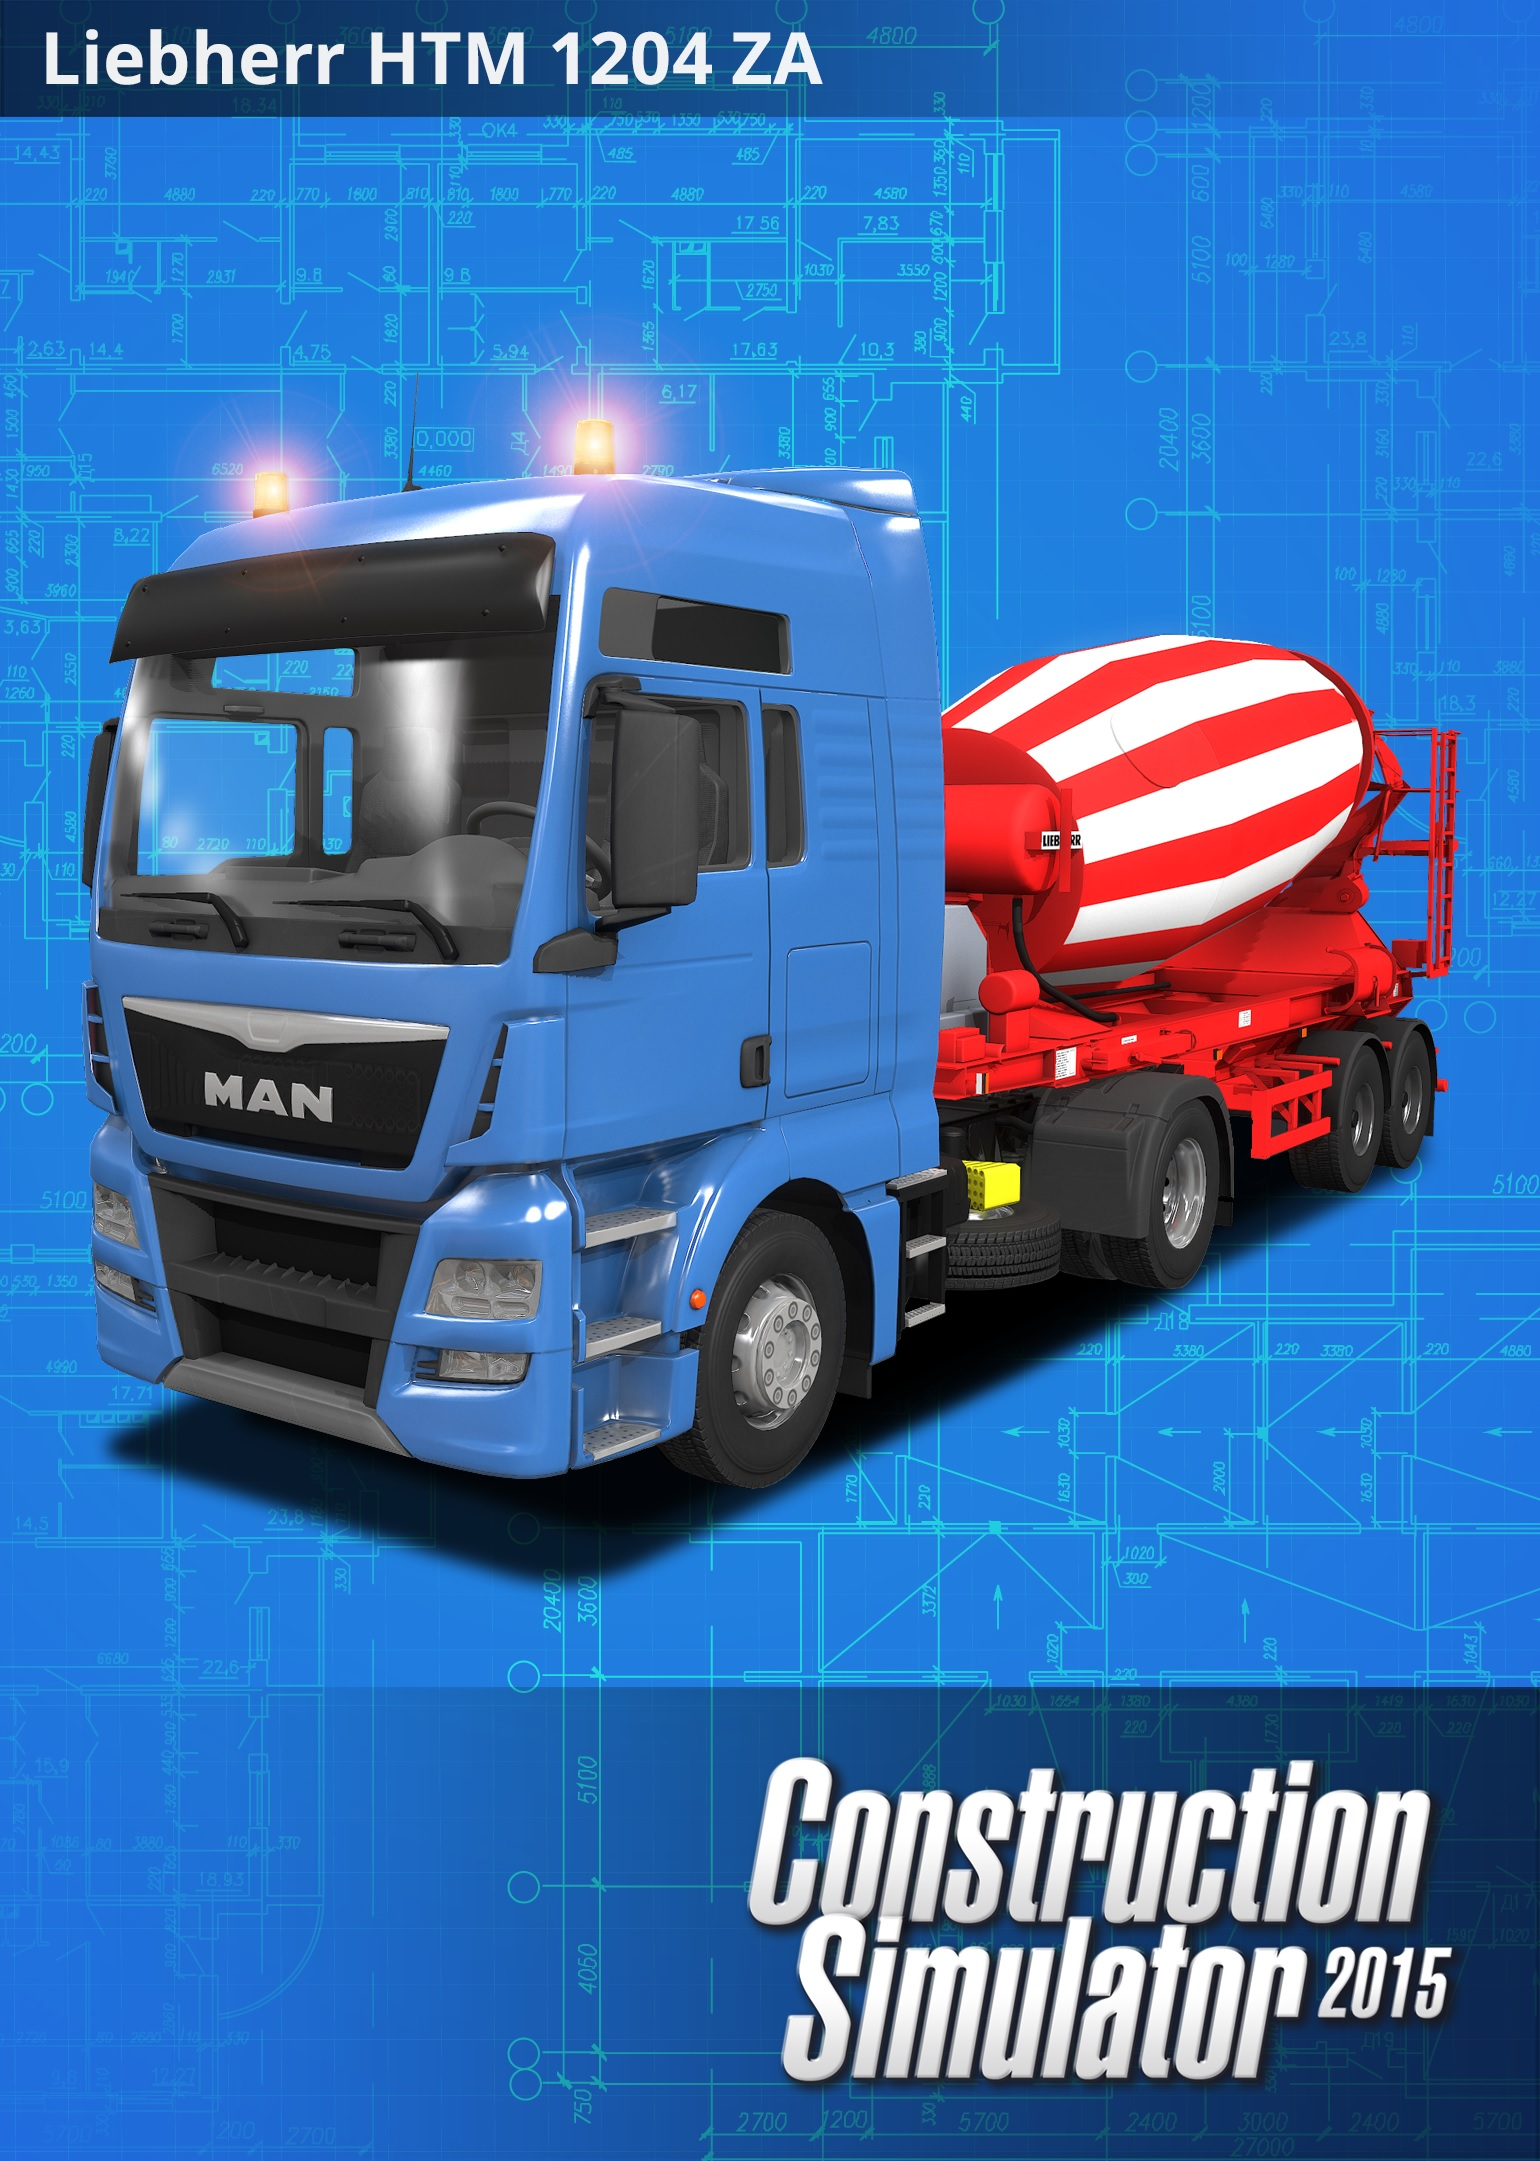 Astragon Construction Simulator 2015 Liebherr HTM 1204 ZA PC Game